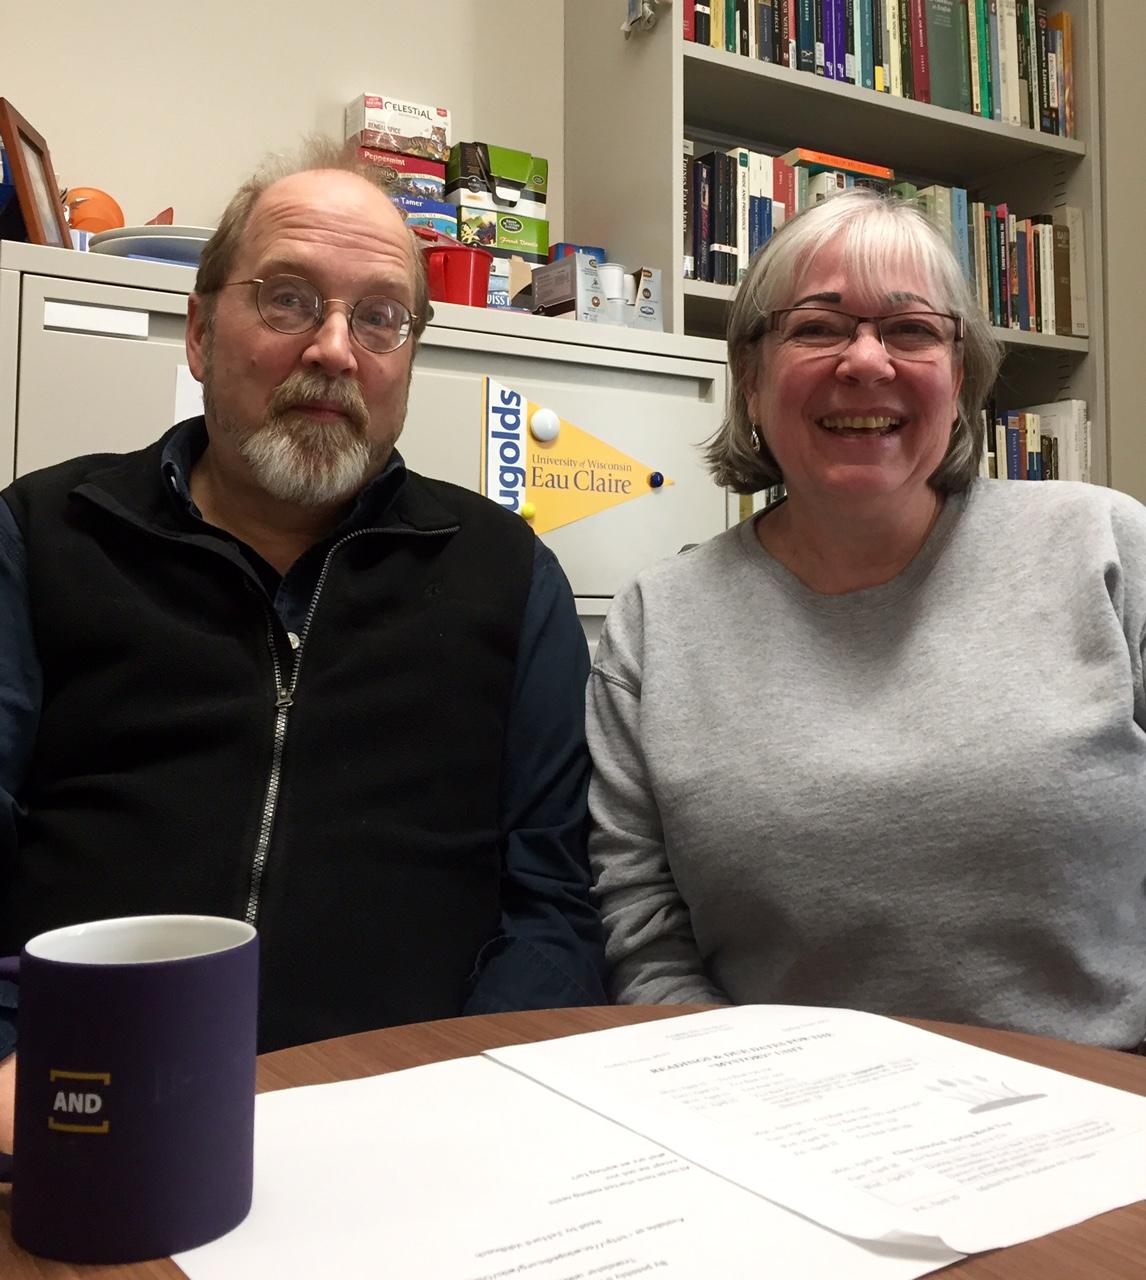 Jeff Vahlbusch and Audrey Fessler